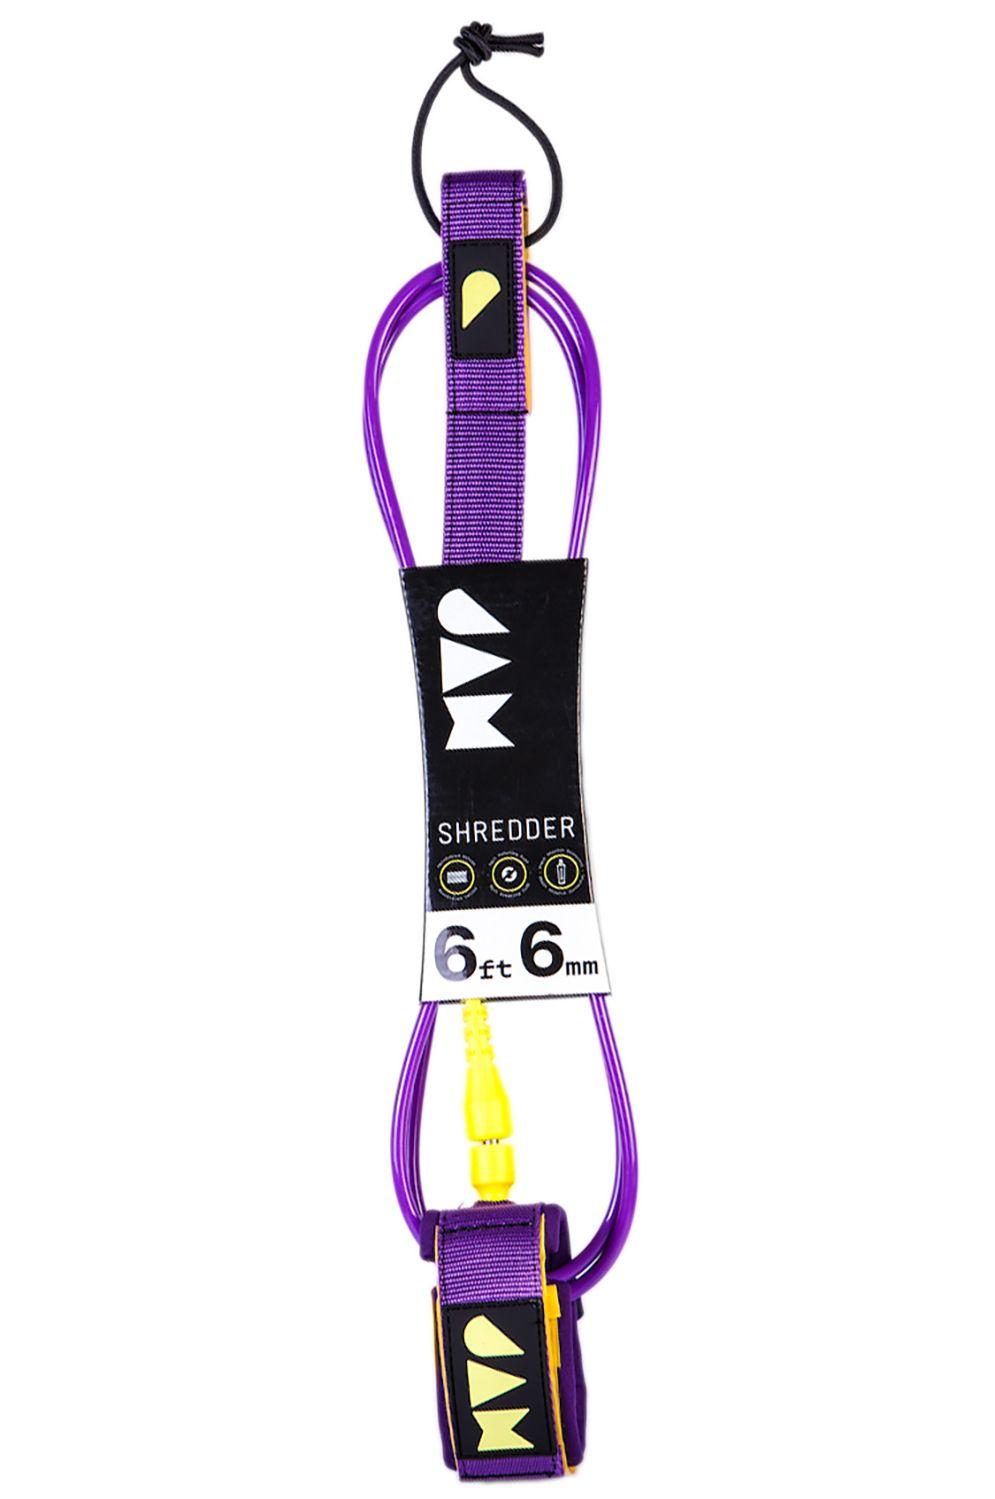 Leash Jam SHREDDER LEASH 6FT 6MM Purple Yellow